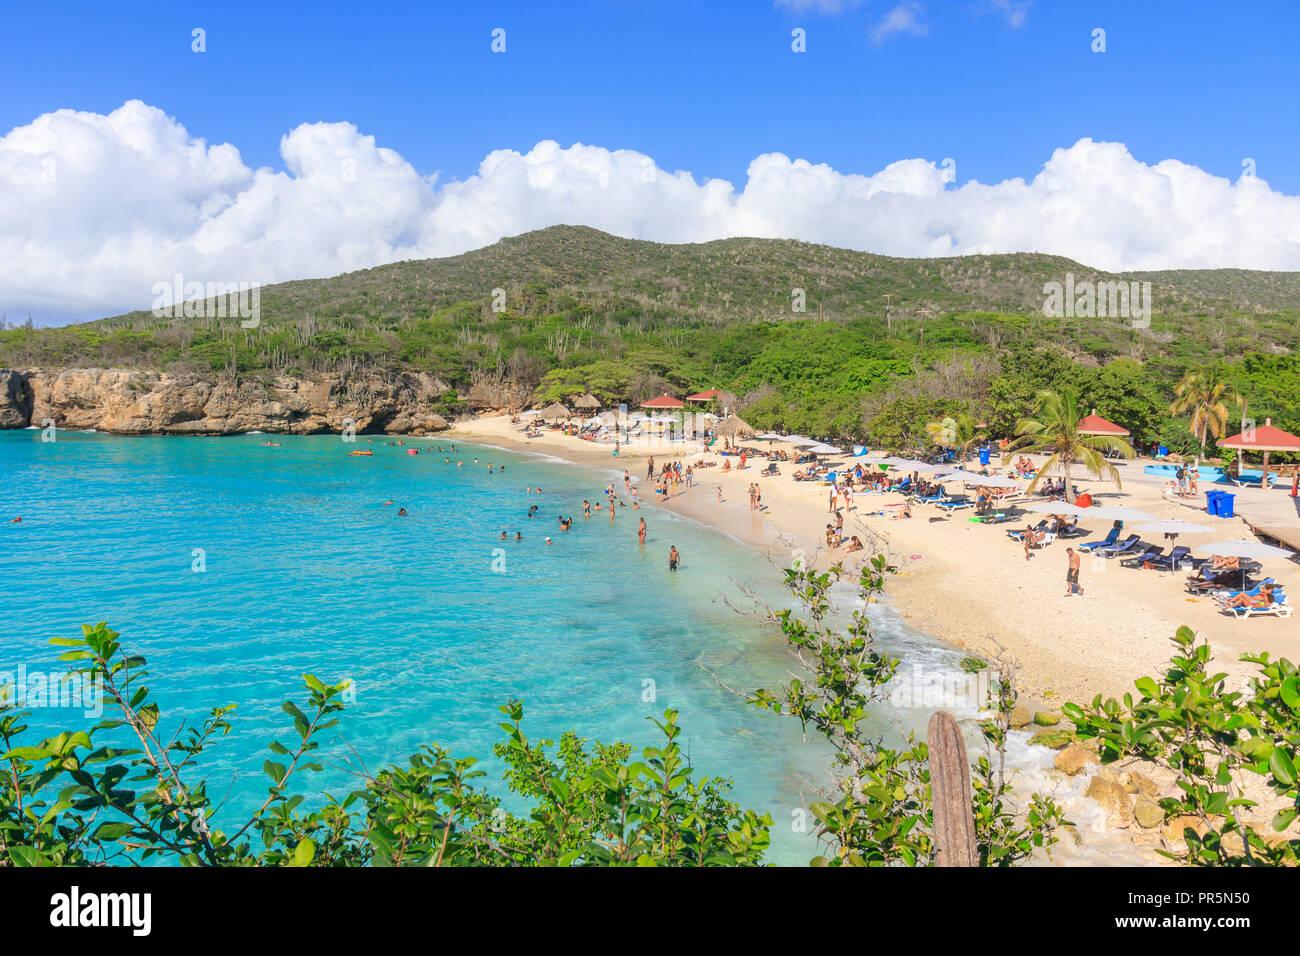 Curacao January 04 2018 Kenepa Grandi Grote Knip Beach